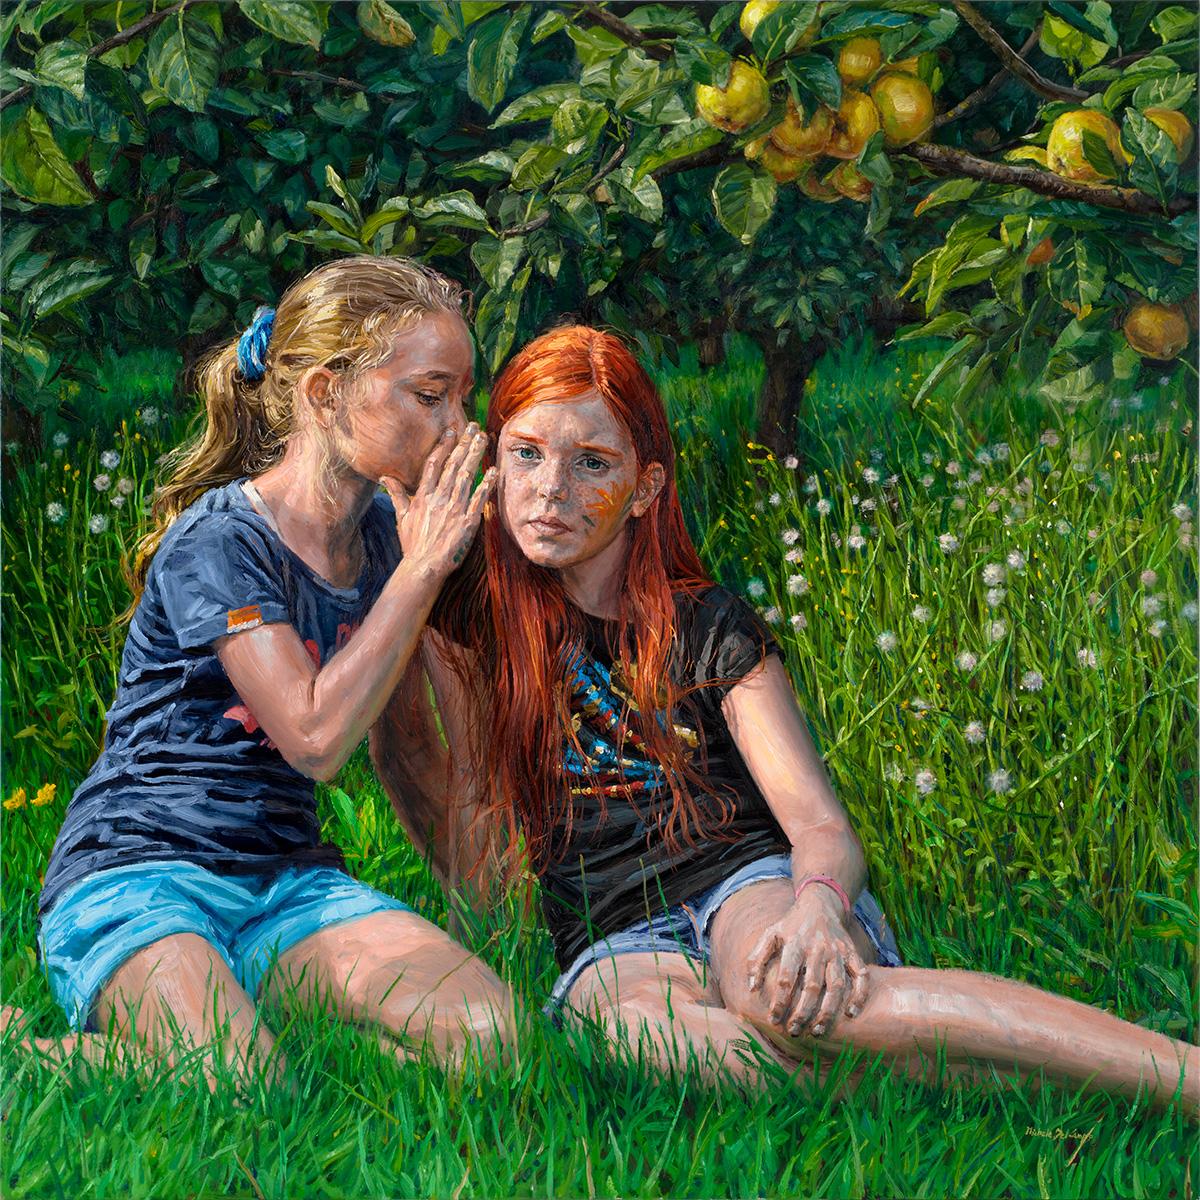 apple-tree-redhead-blonde-girls-young-friends-121x121cm.jpg